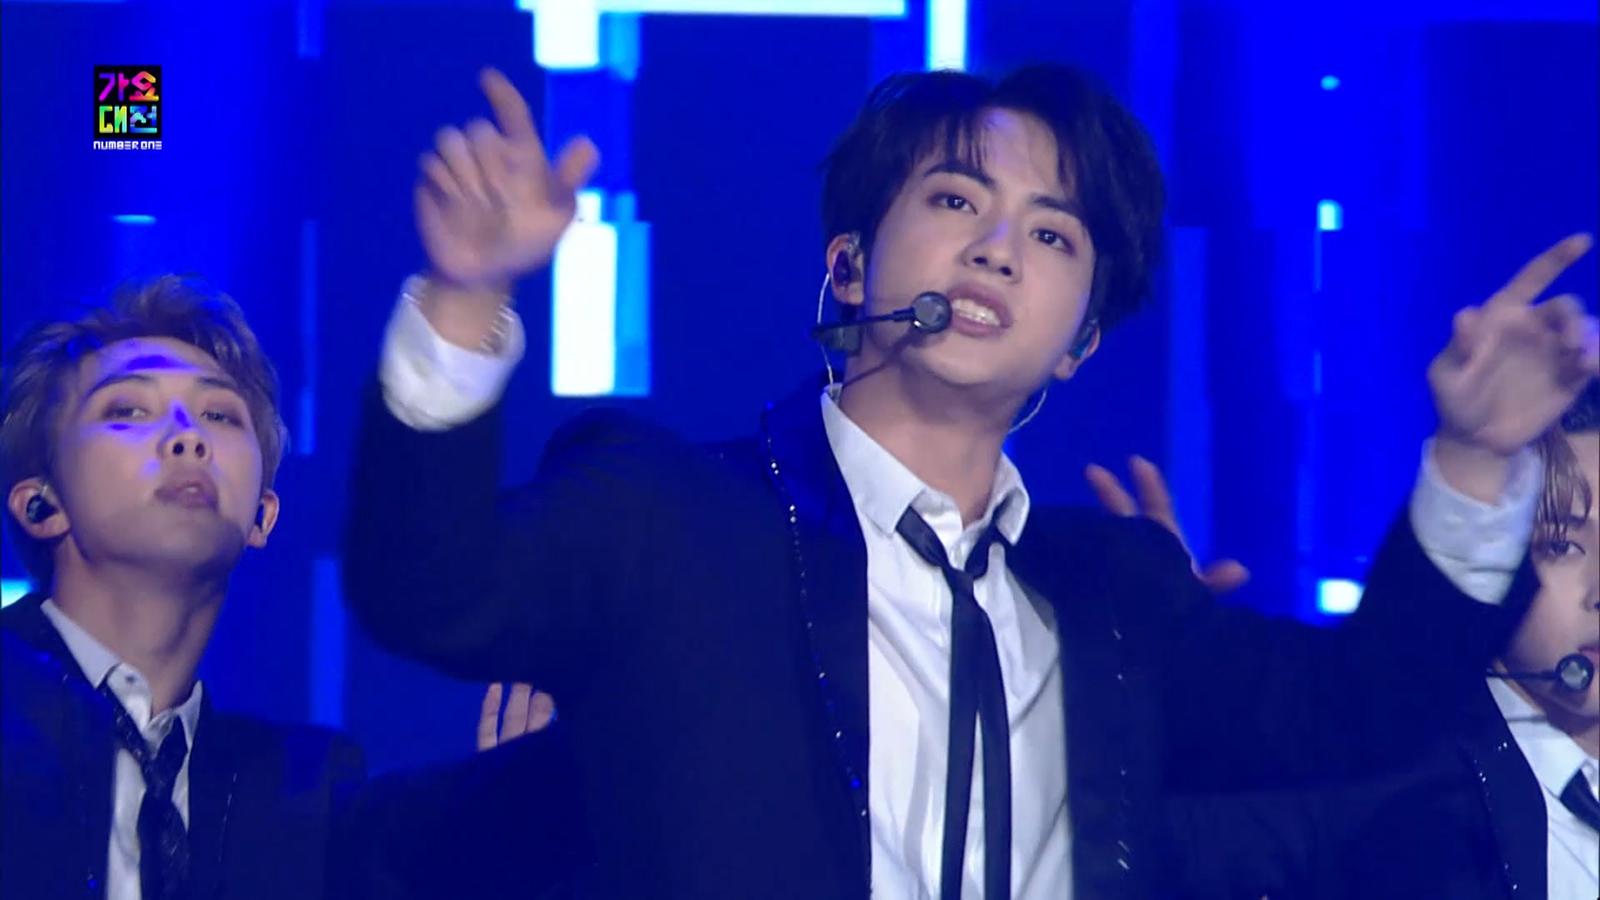 2017 SBS 歌謠大戰音樂成會 (Gayo Daejeon_Music Festival) 第 2集